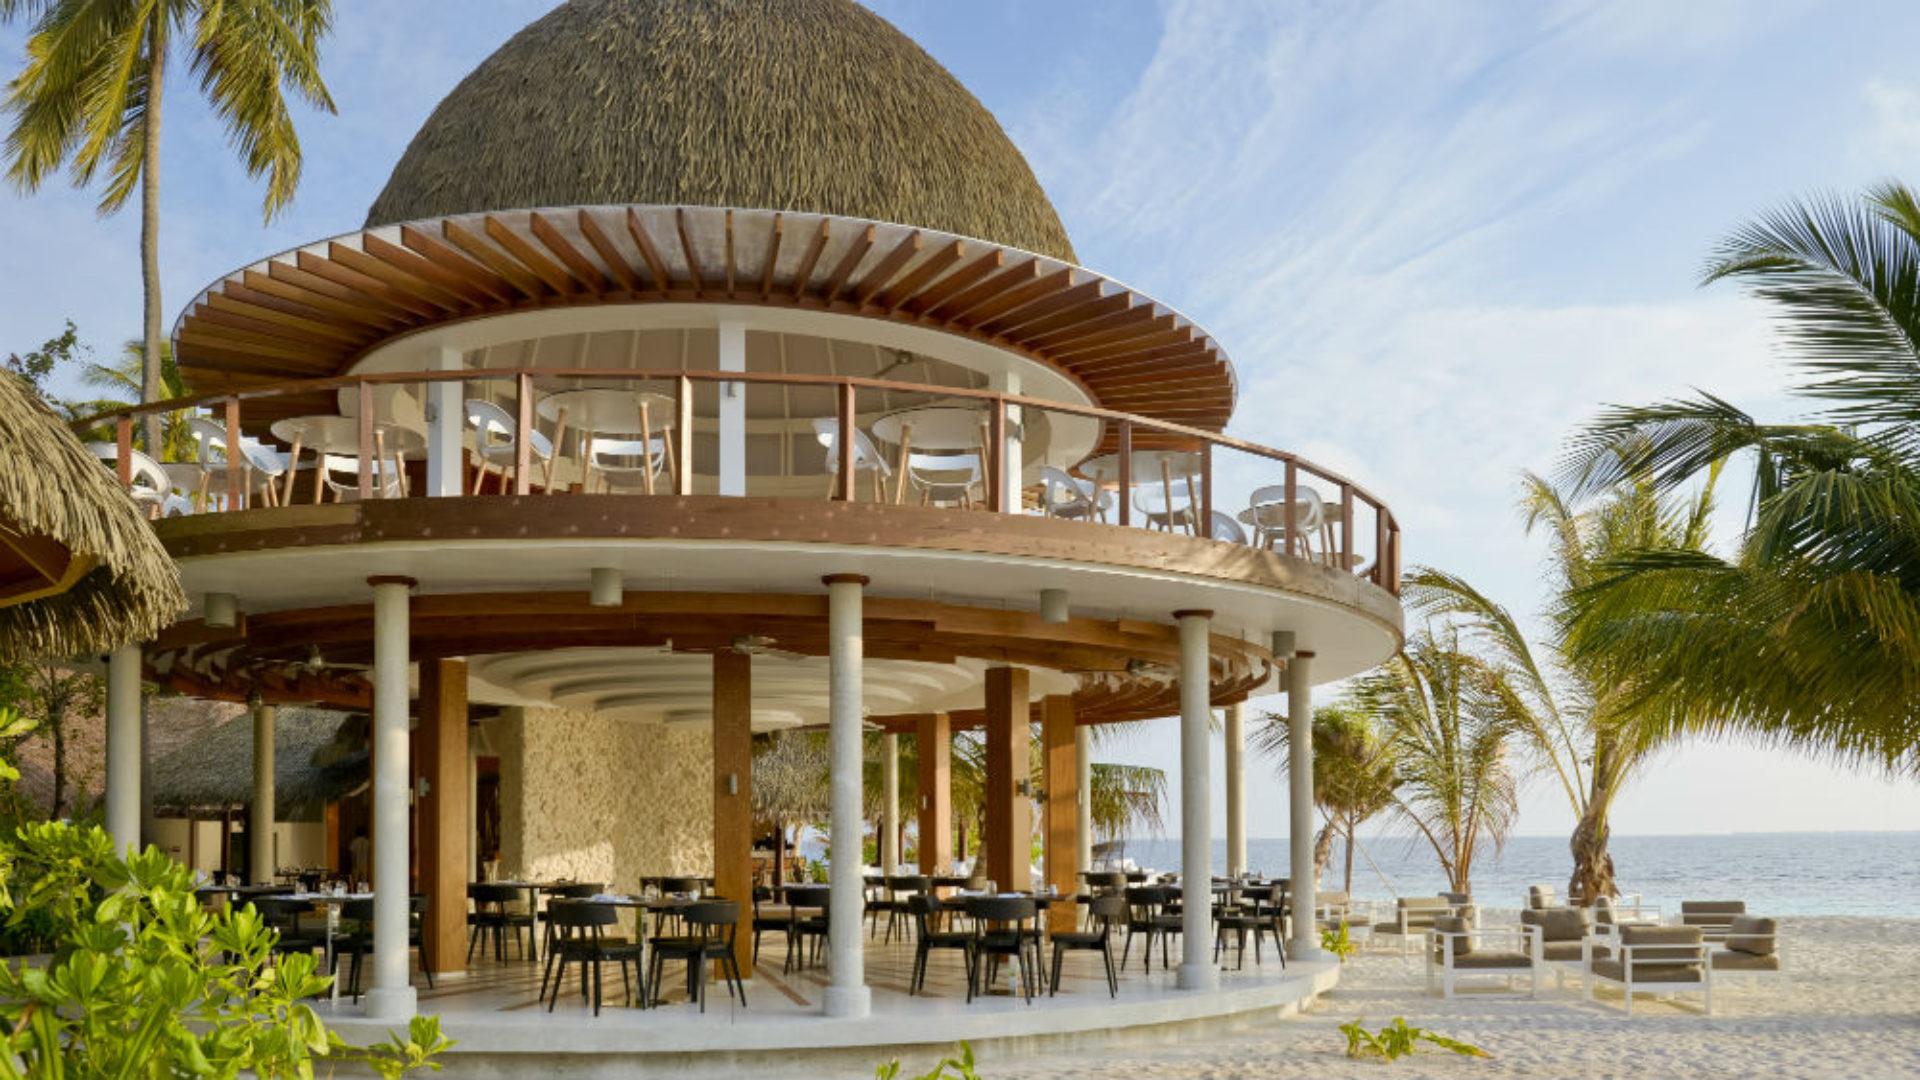 The Market restaurant at the Kandolhu Maldives